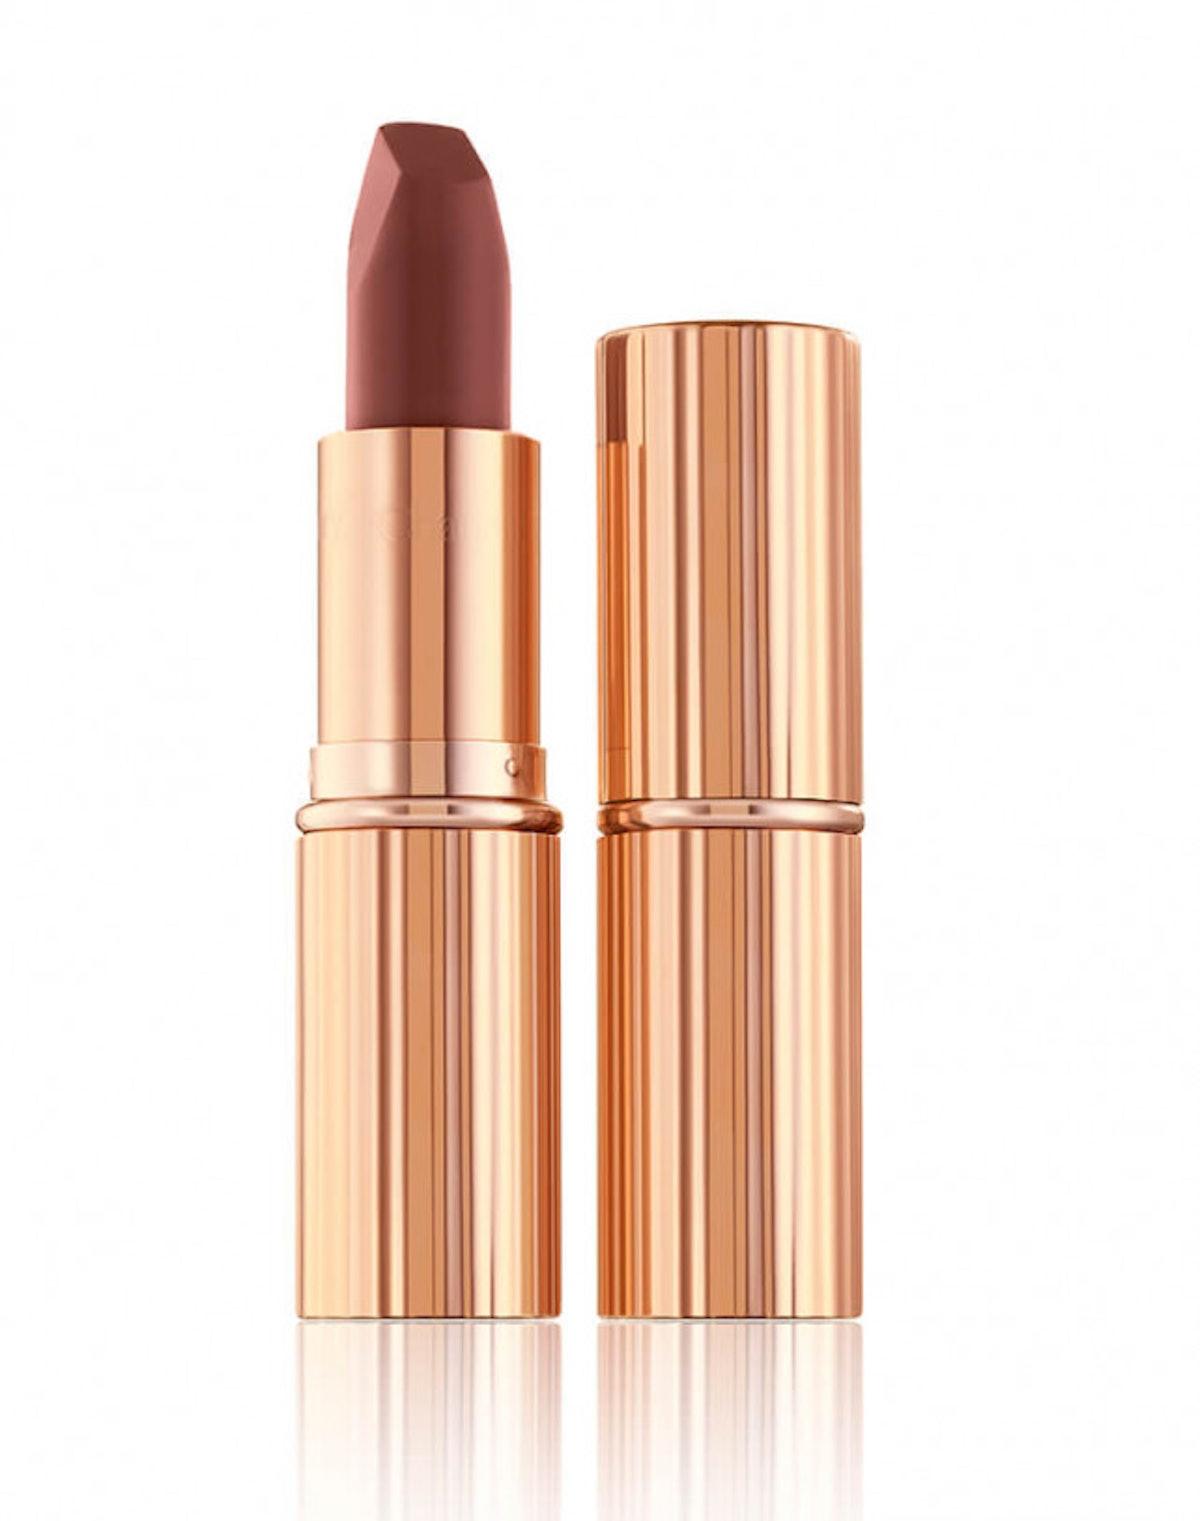 Matte Revolution Supermodel Lipstick in Super Nineties